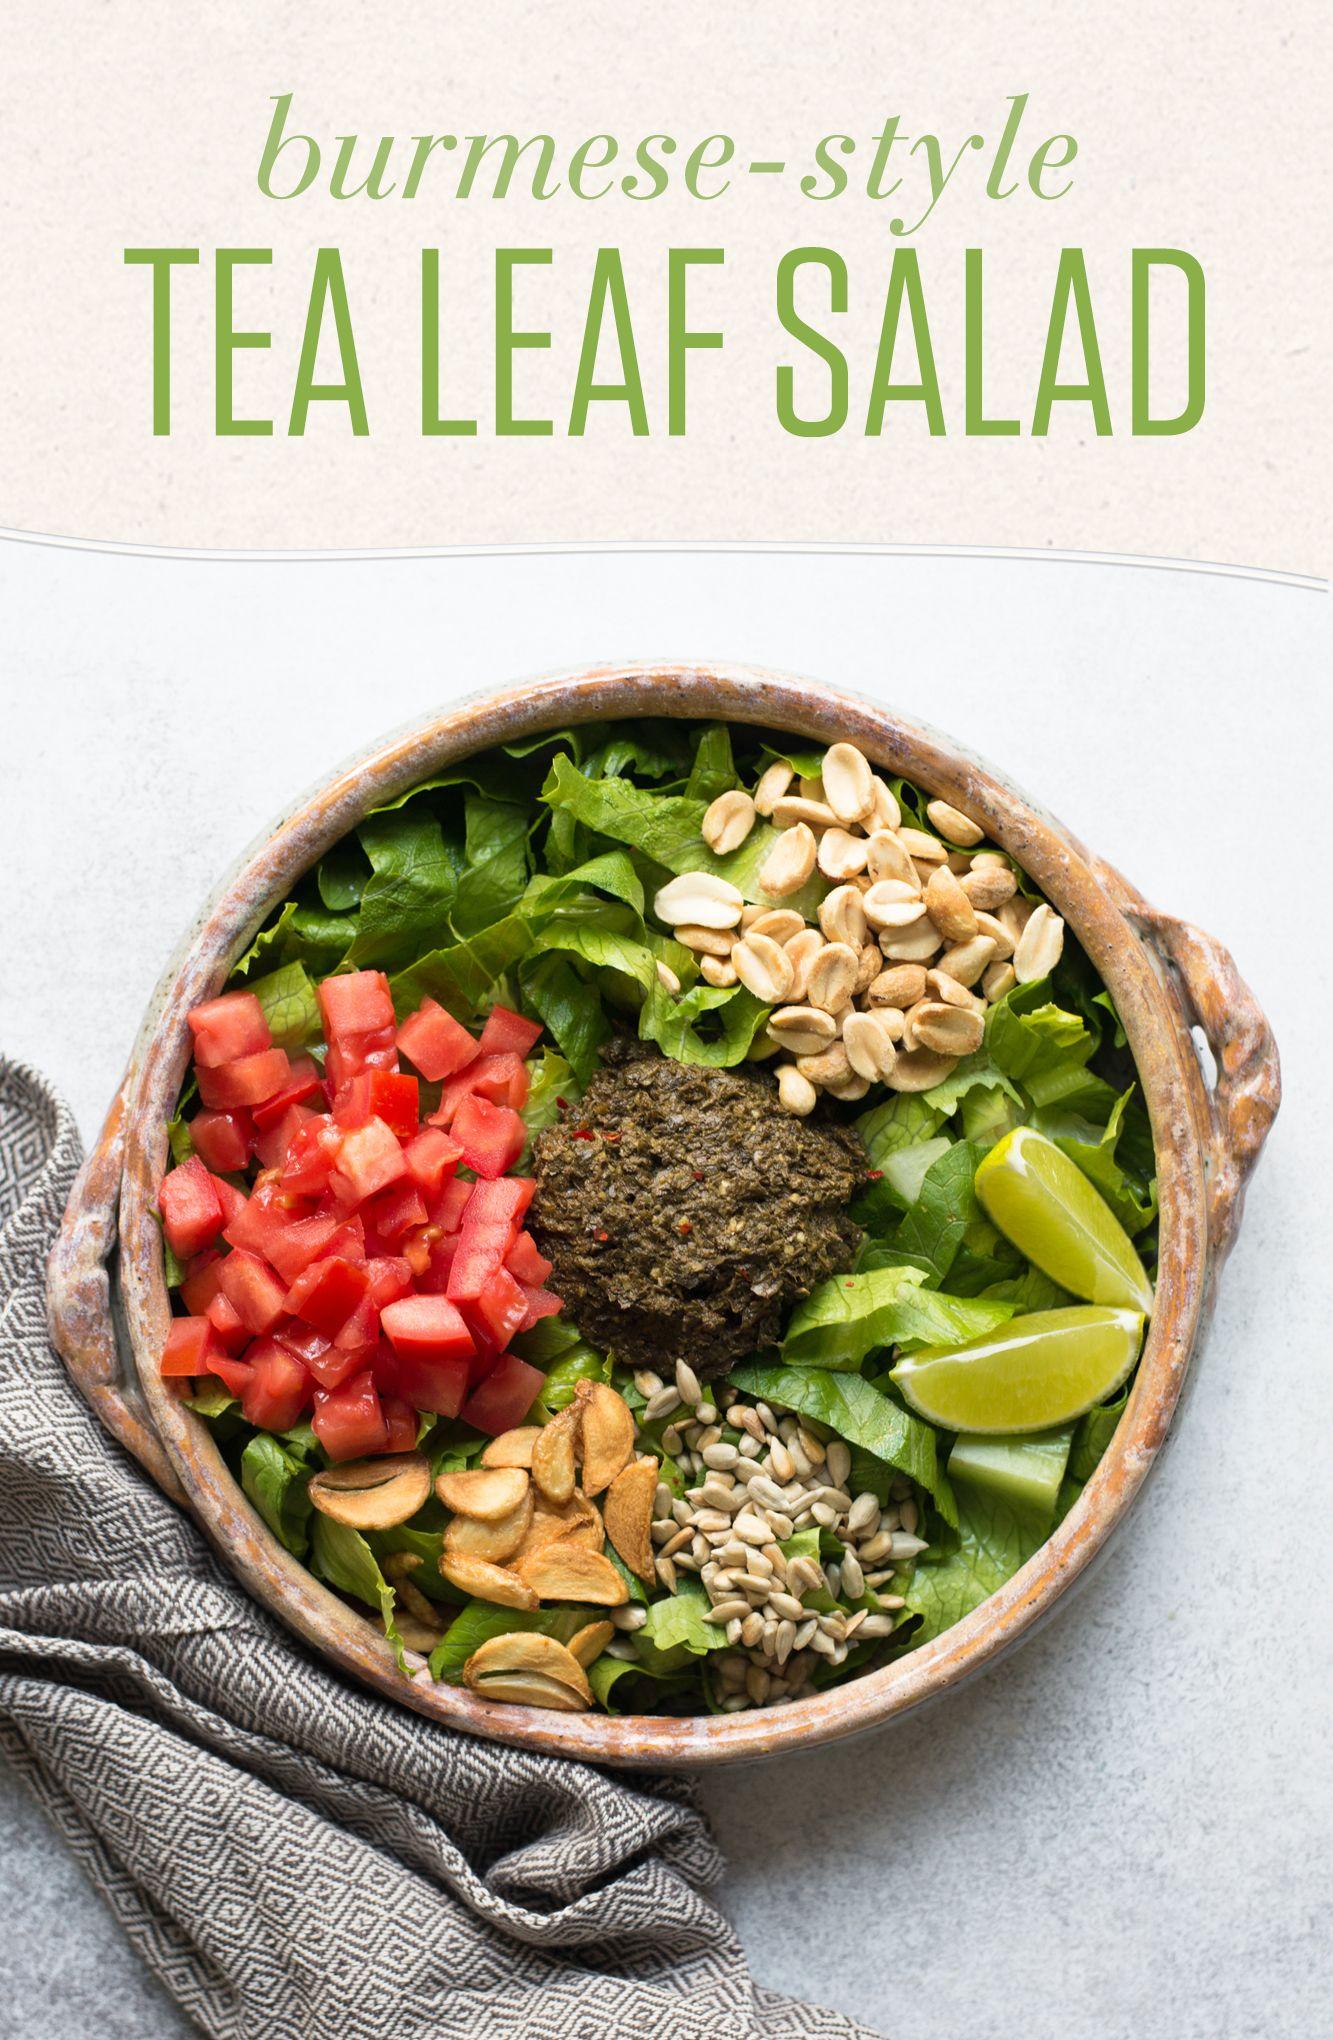 Tea leaf salad is a tried true burmese cuisine mainstay this tea leaf salad is a tried true burmese cuisine mainstay this recipe using numi forumfinder Gallery